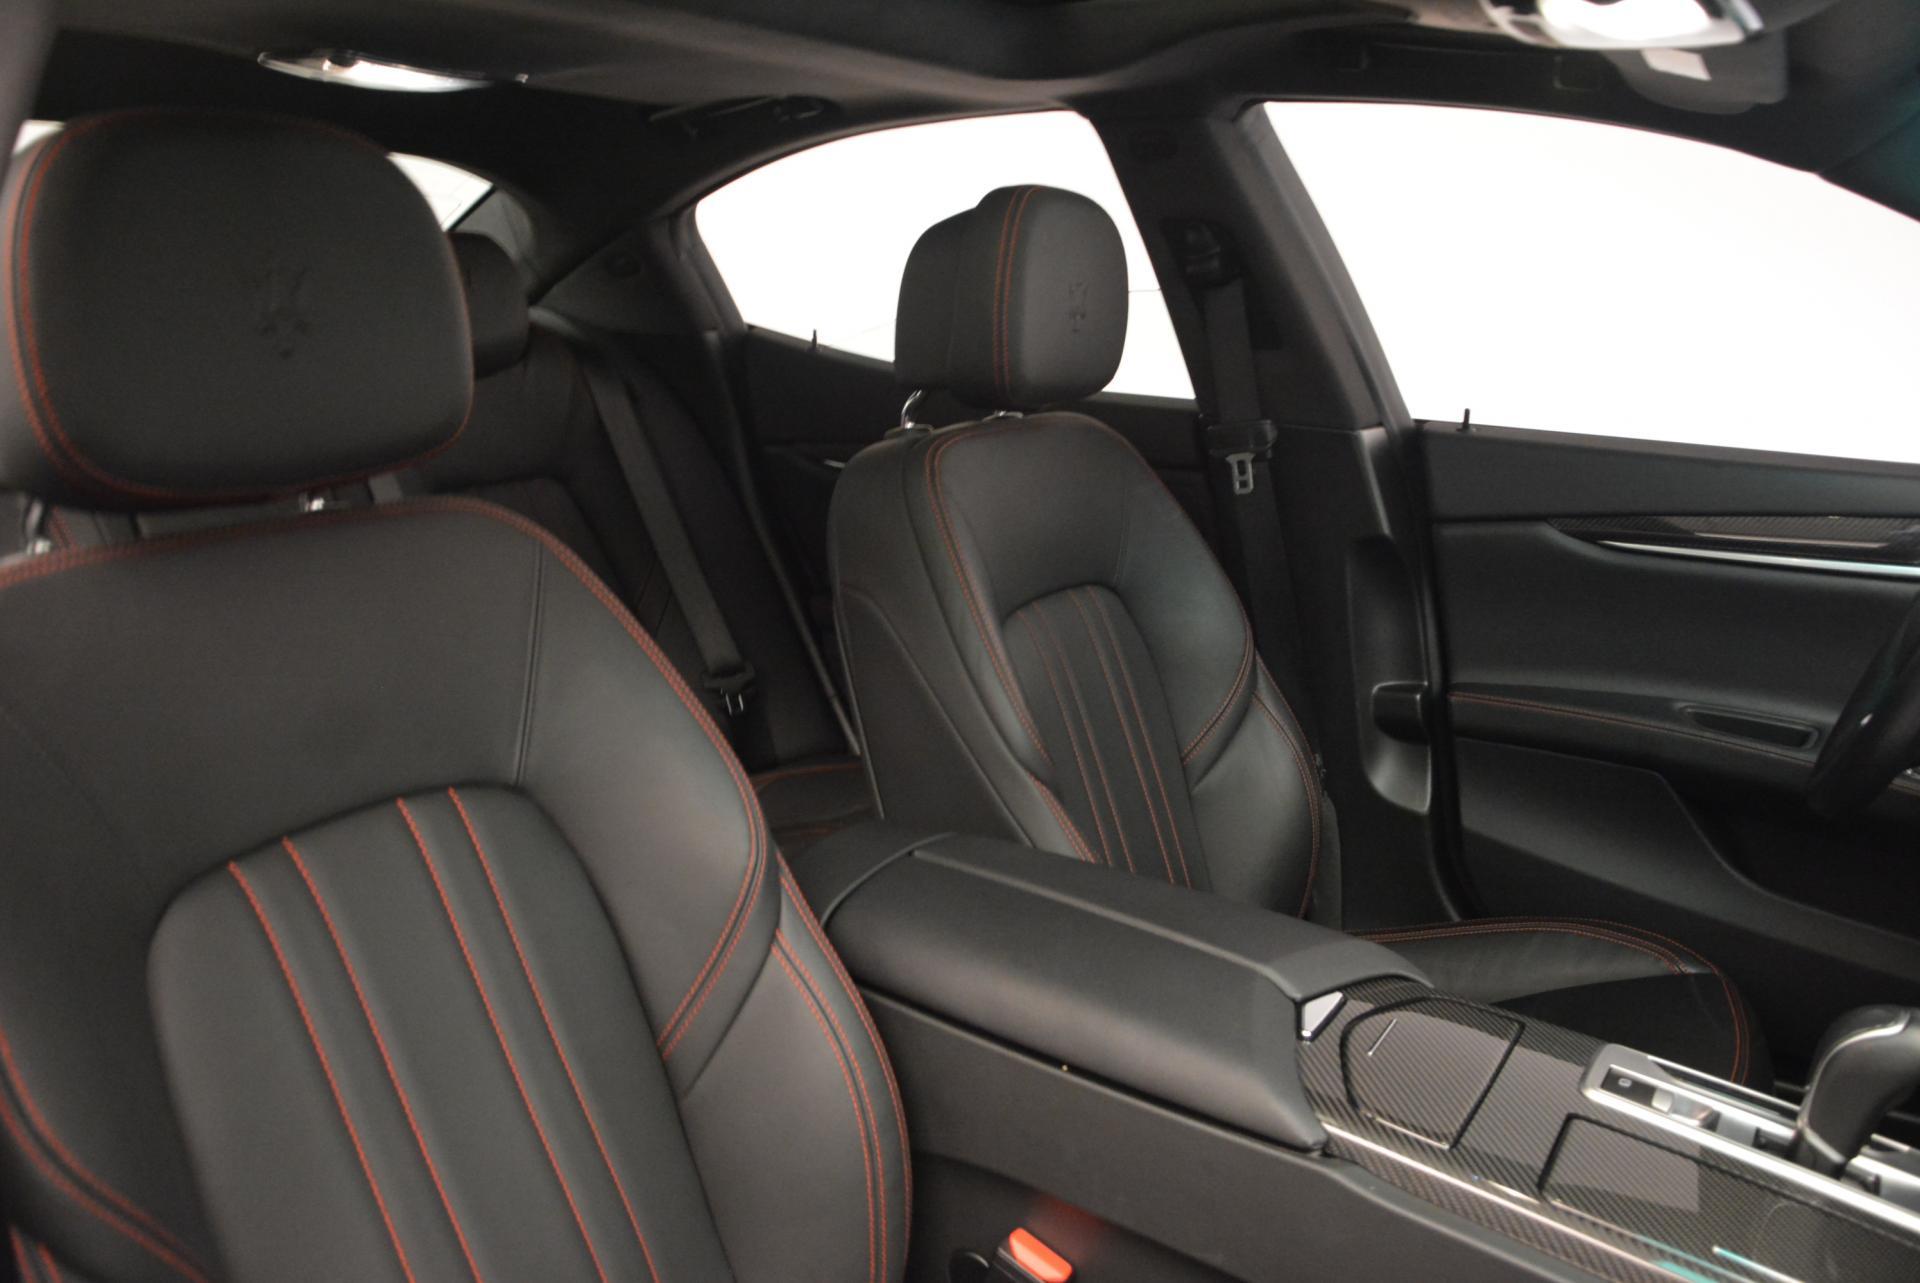 Used 2015 Maserati Ghibli S Q4 For Sale 0 In Greenwich, CT